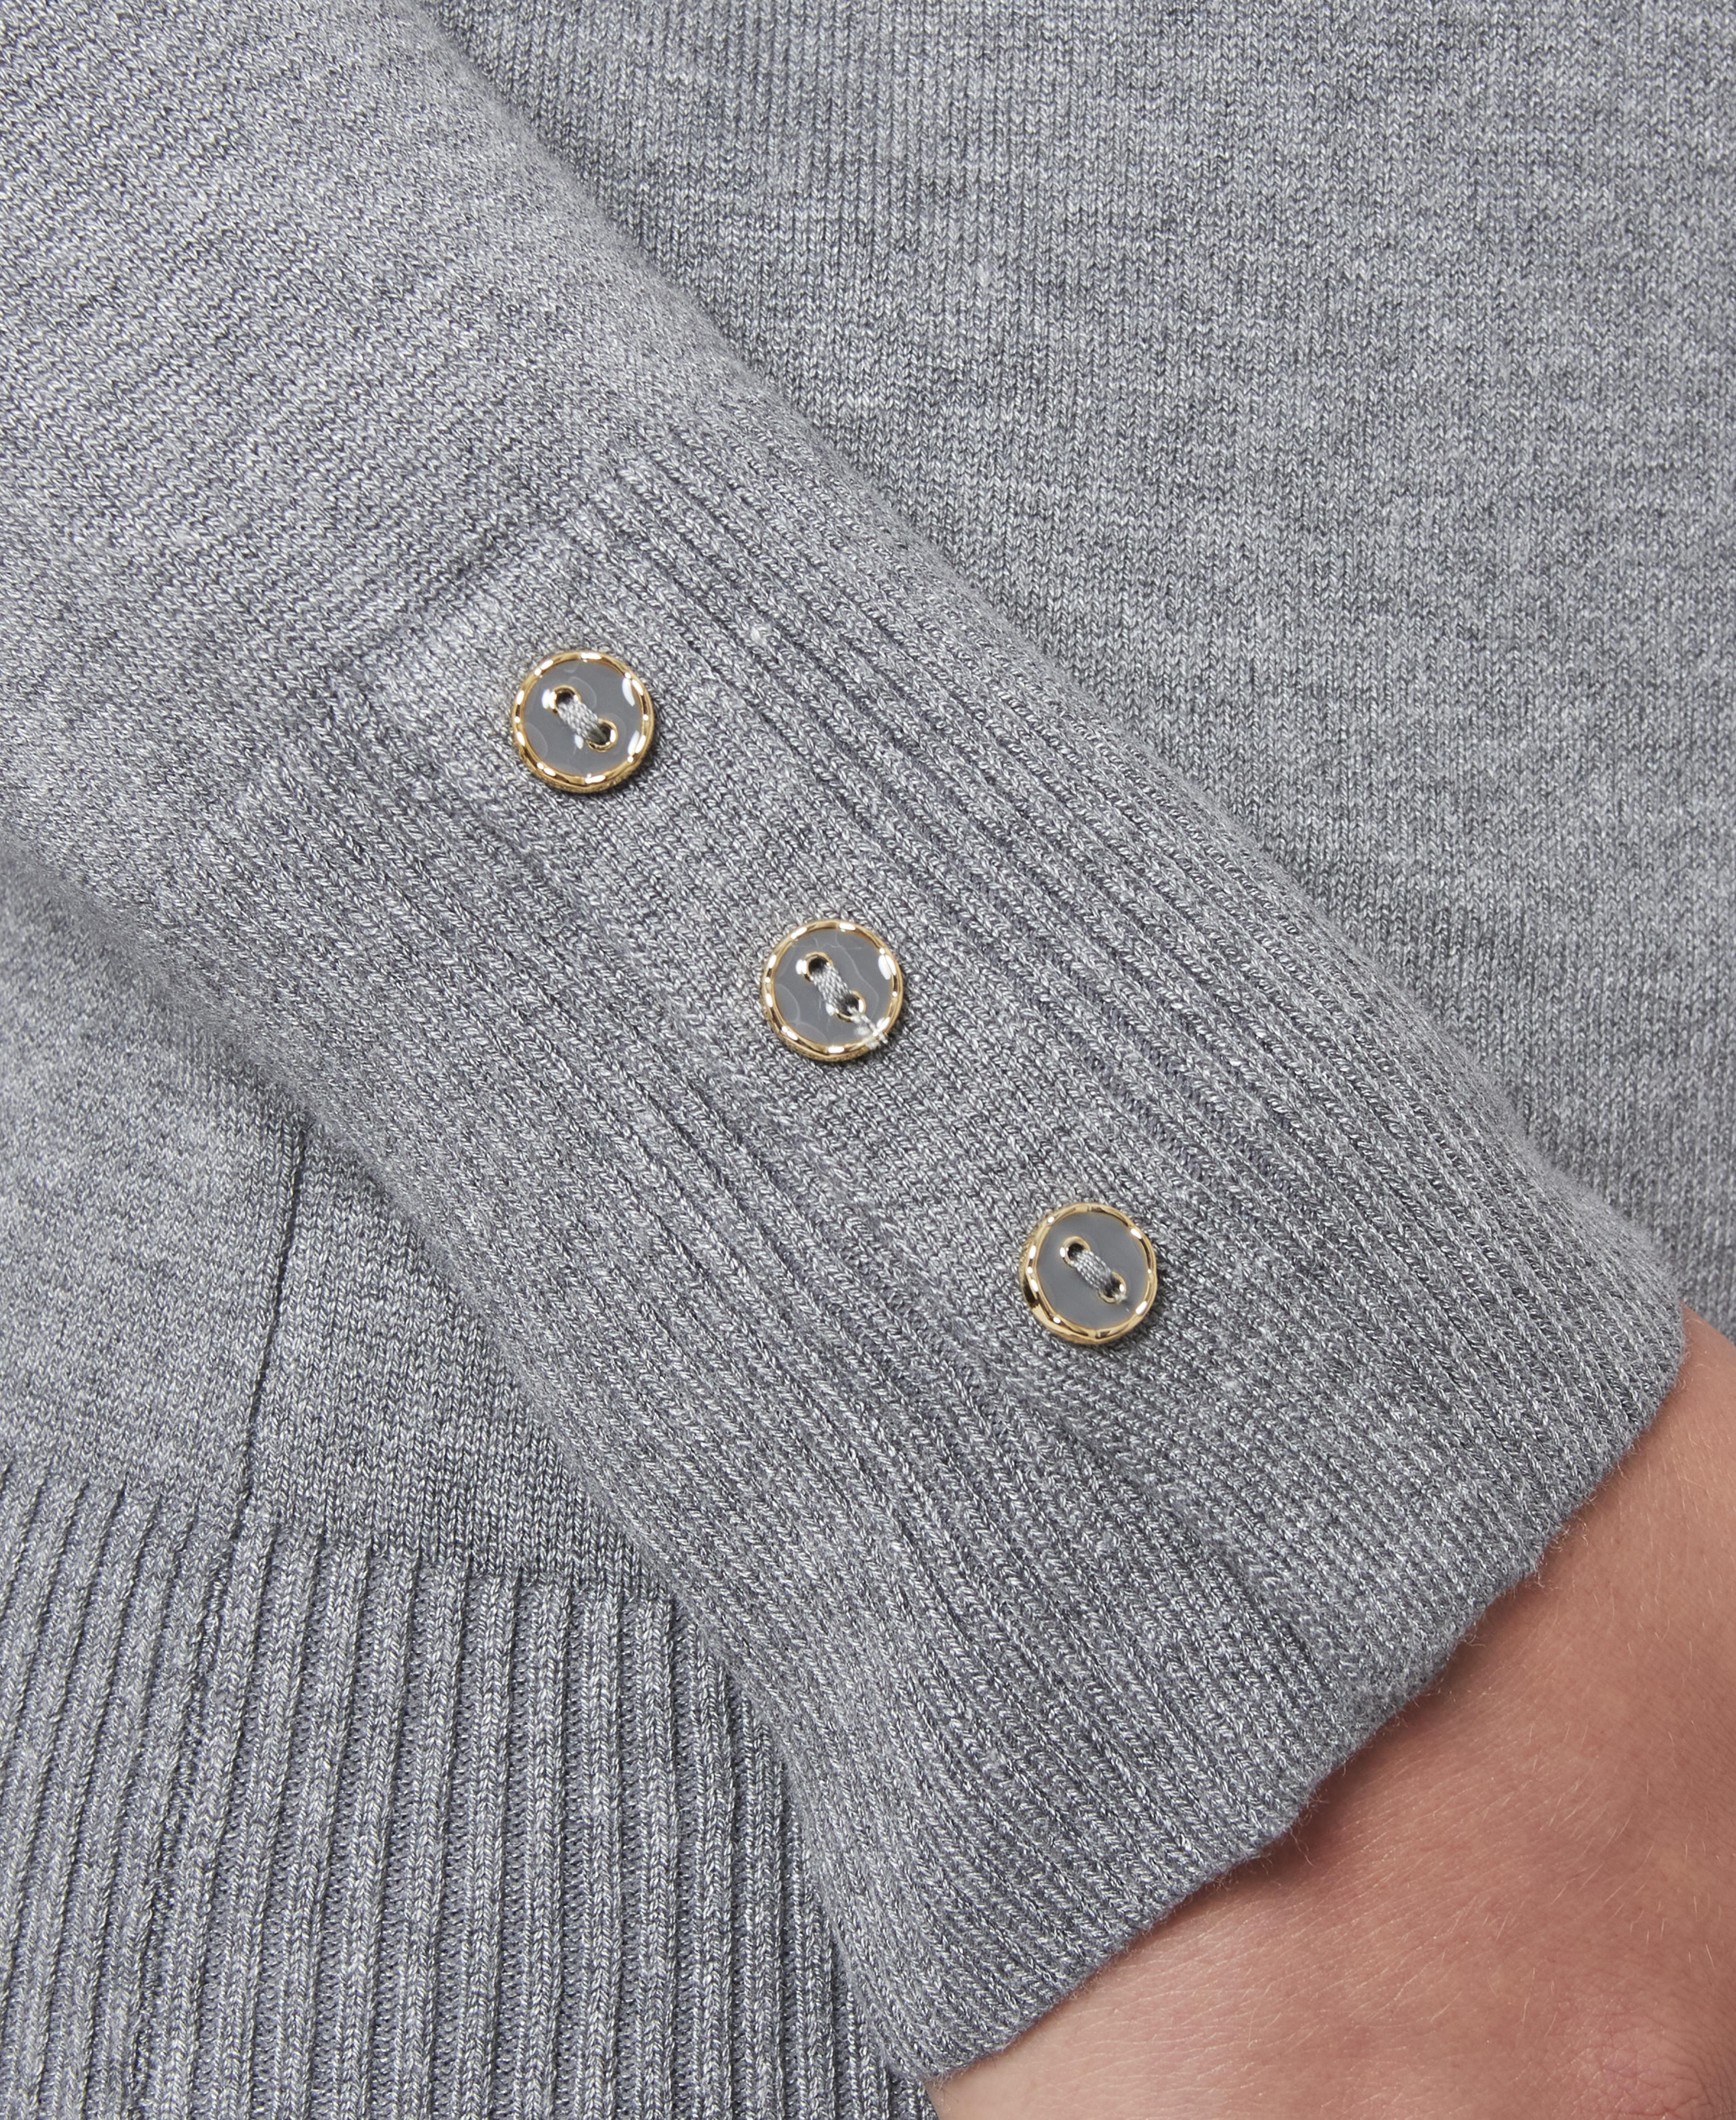 Solid Turtleneck with Button Cuff in Medium Heather Grey